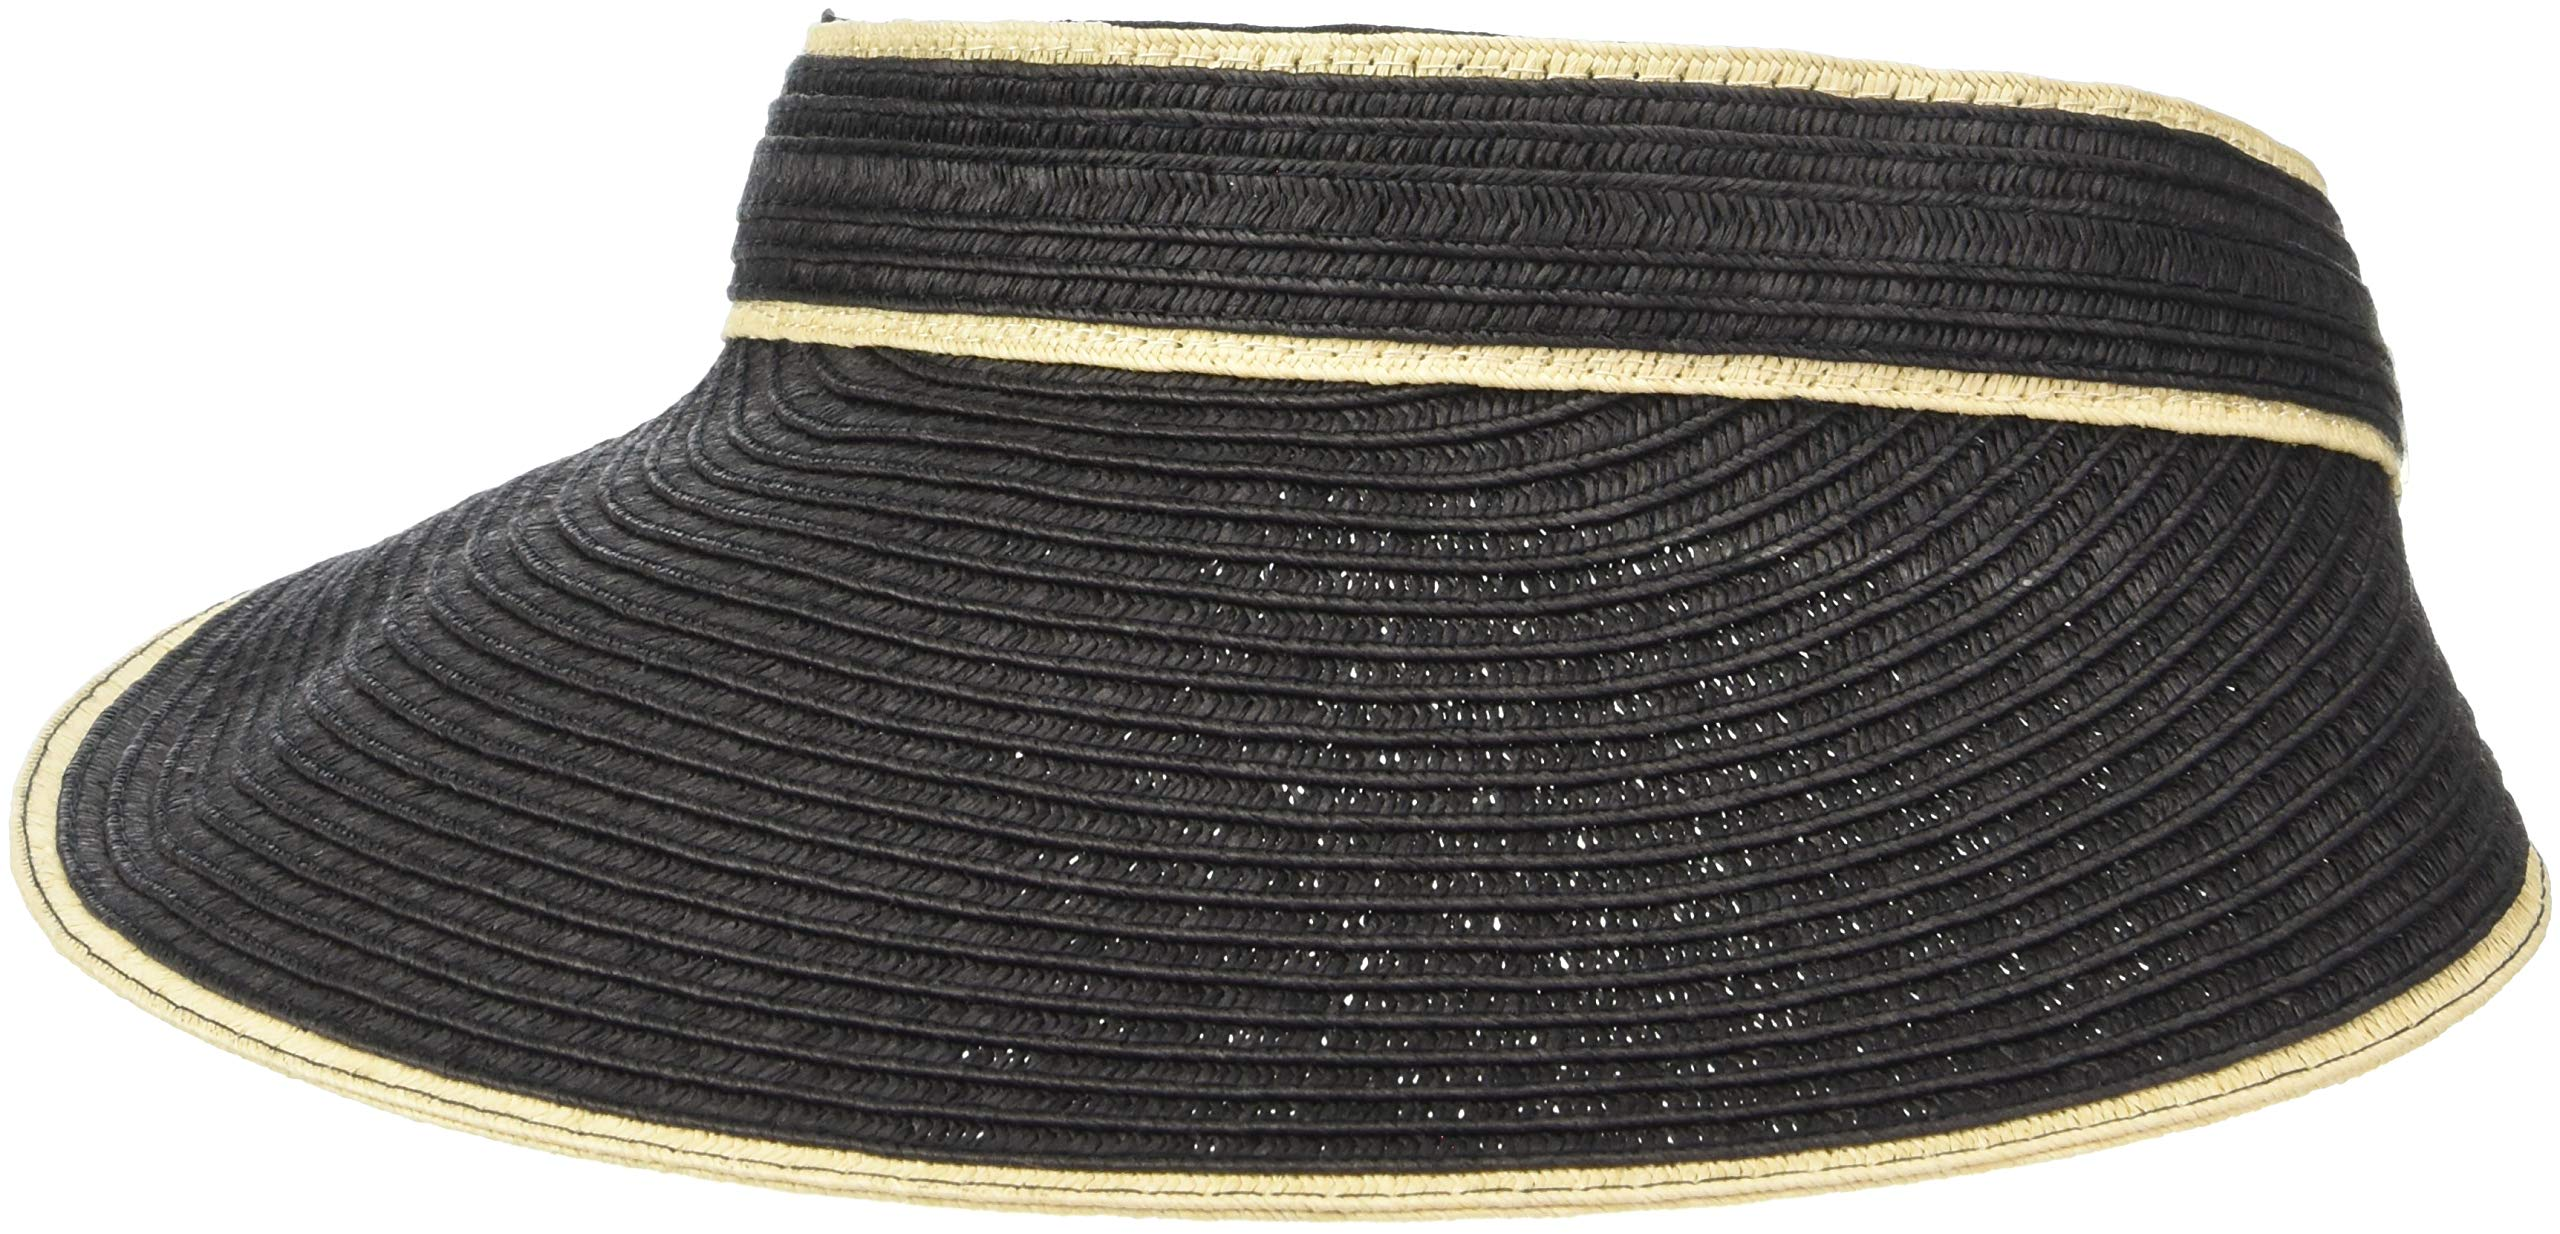 Calvin Klein Women's Straw Visor with Elastic Band, Black, One Size